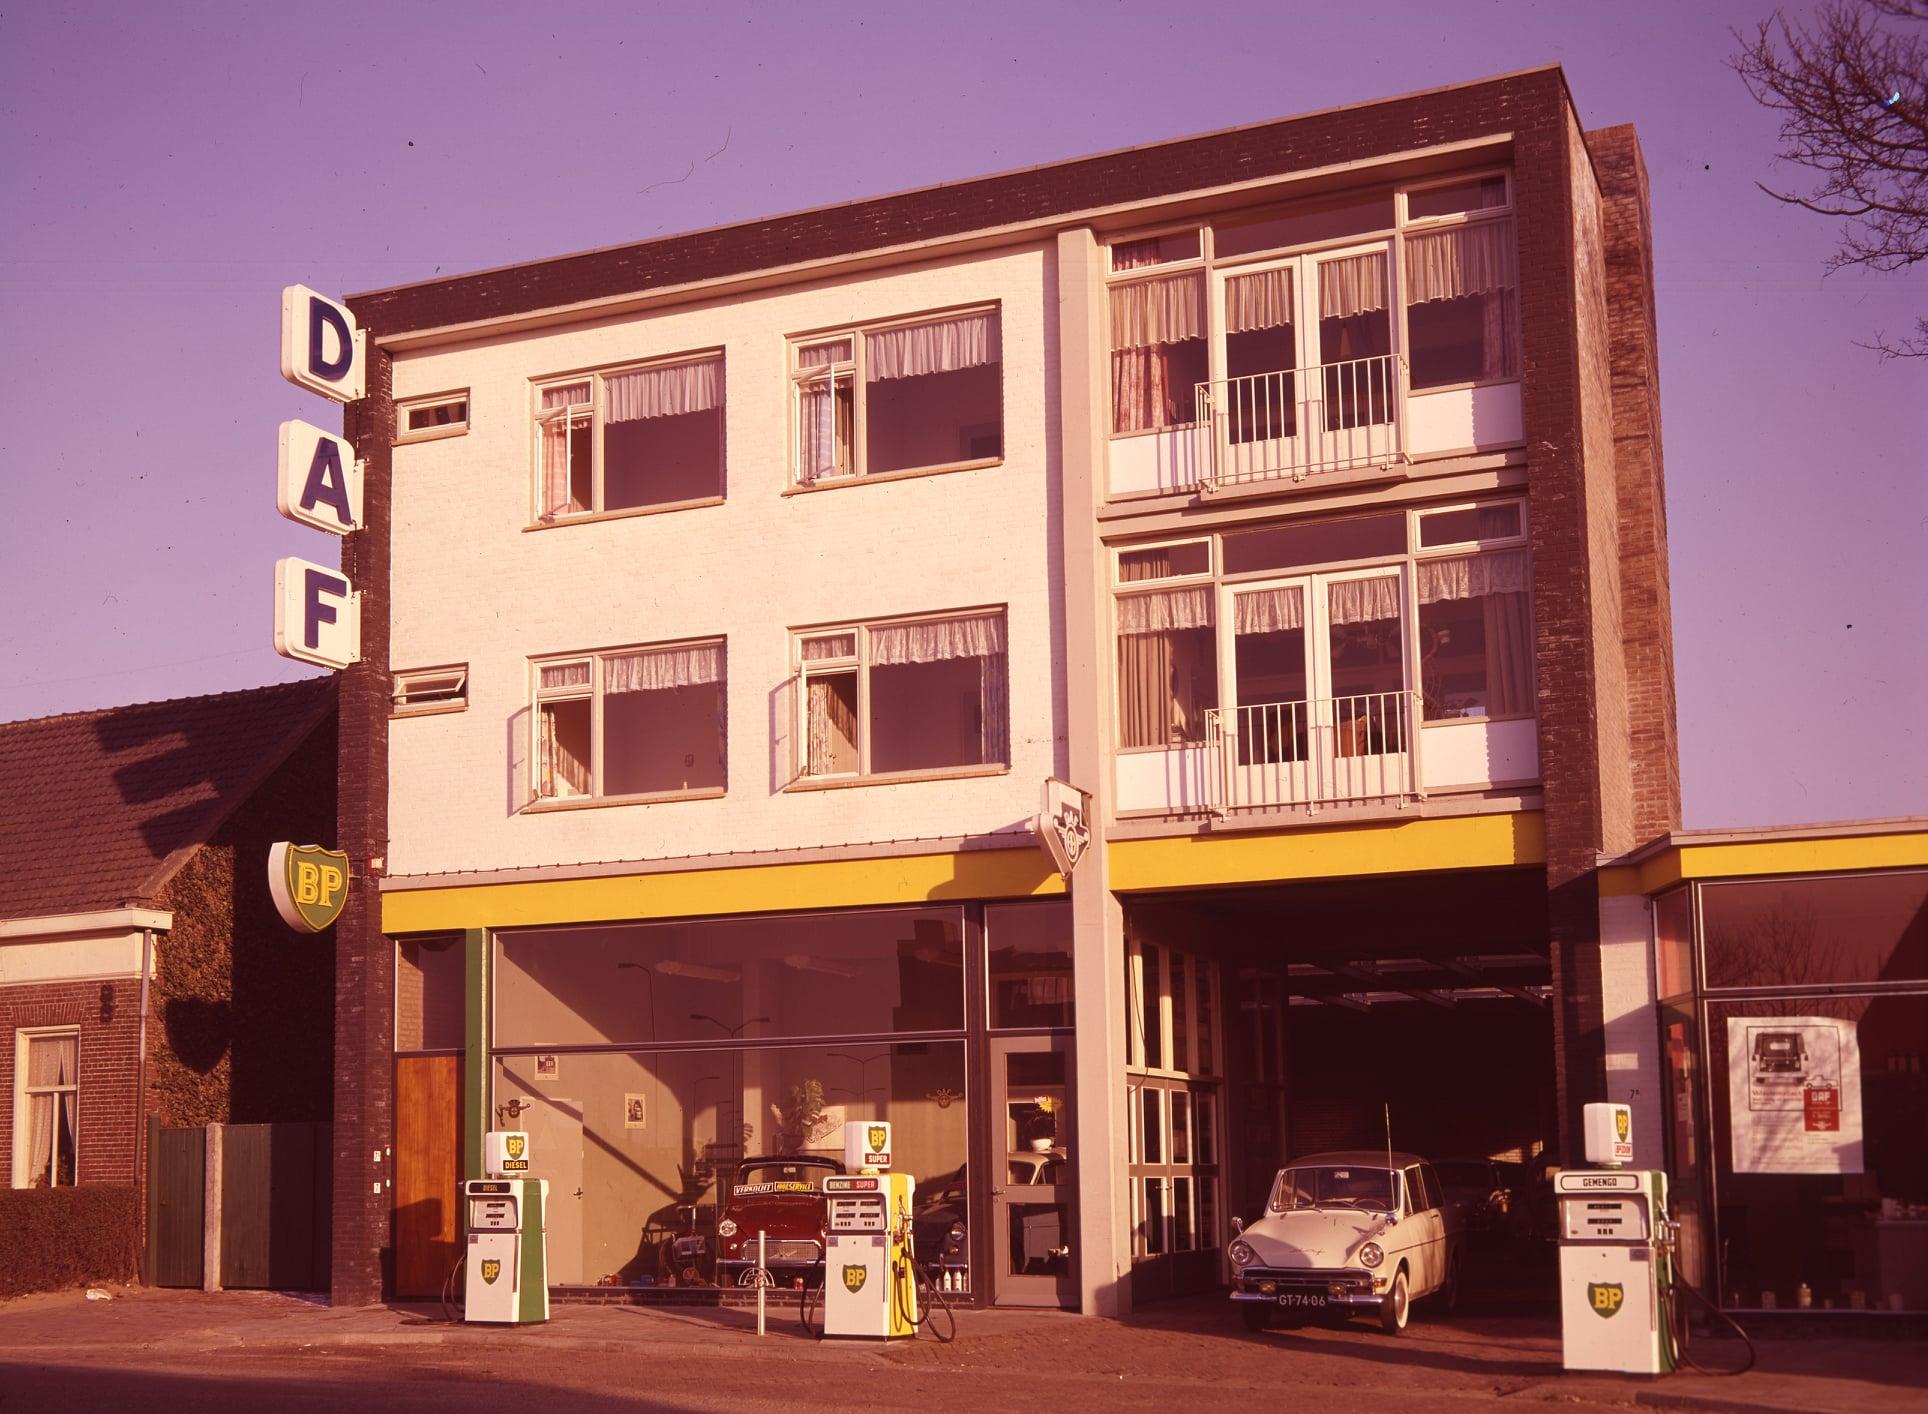 DAF-Garage-de-Burgh-(7)